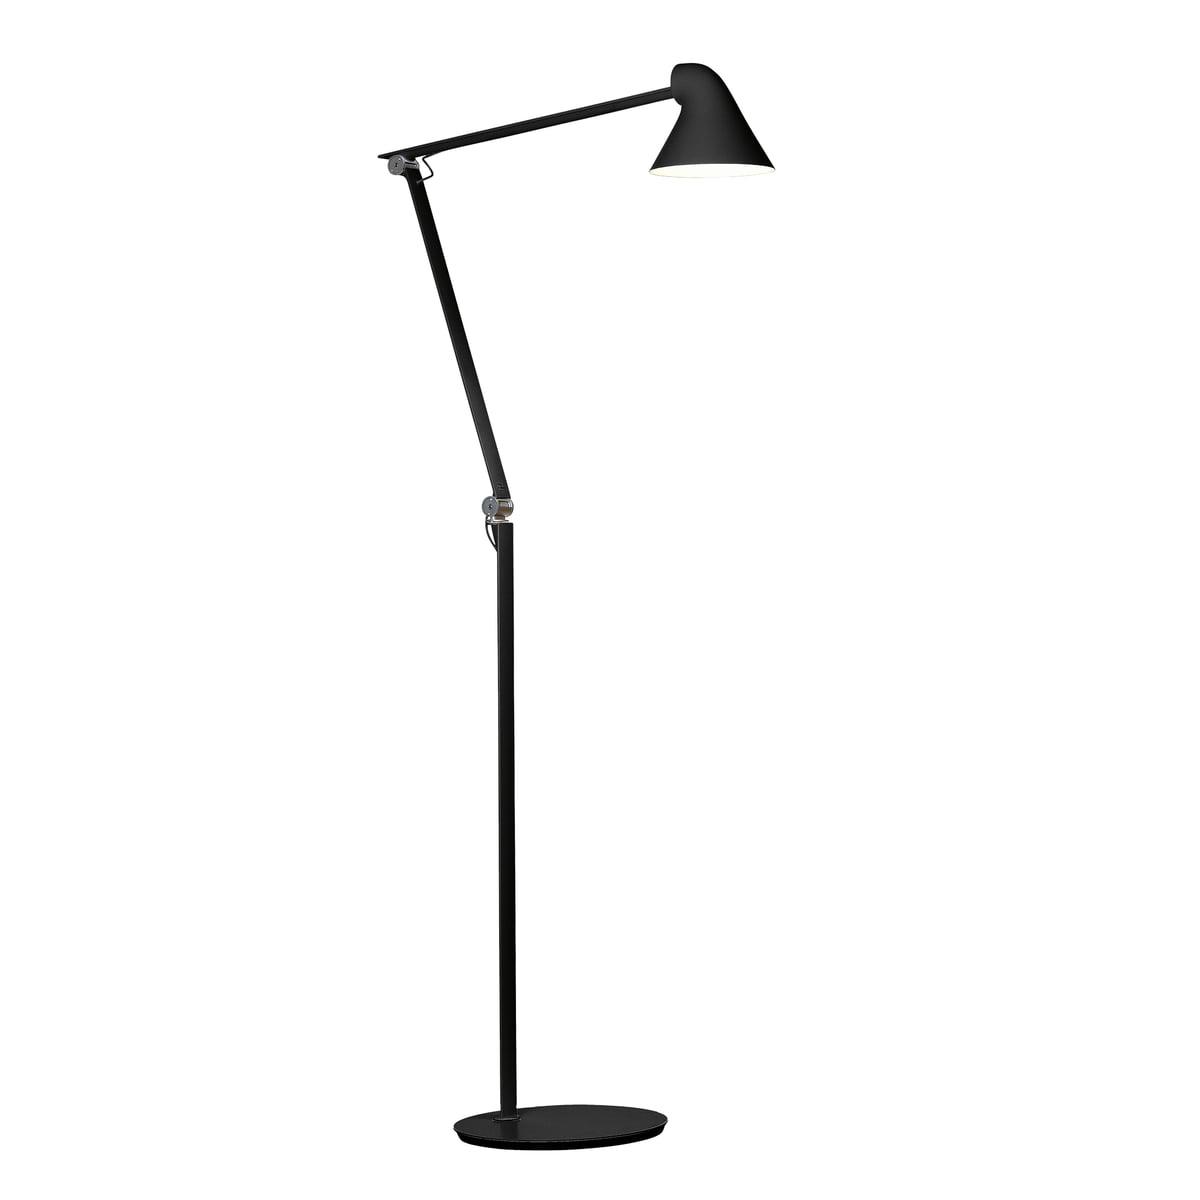 njp led floor lamp by louis poulsen. Black Bedroom Furniture Sets. Home Design Ideas